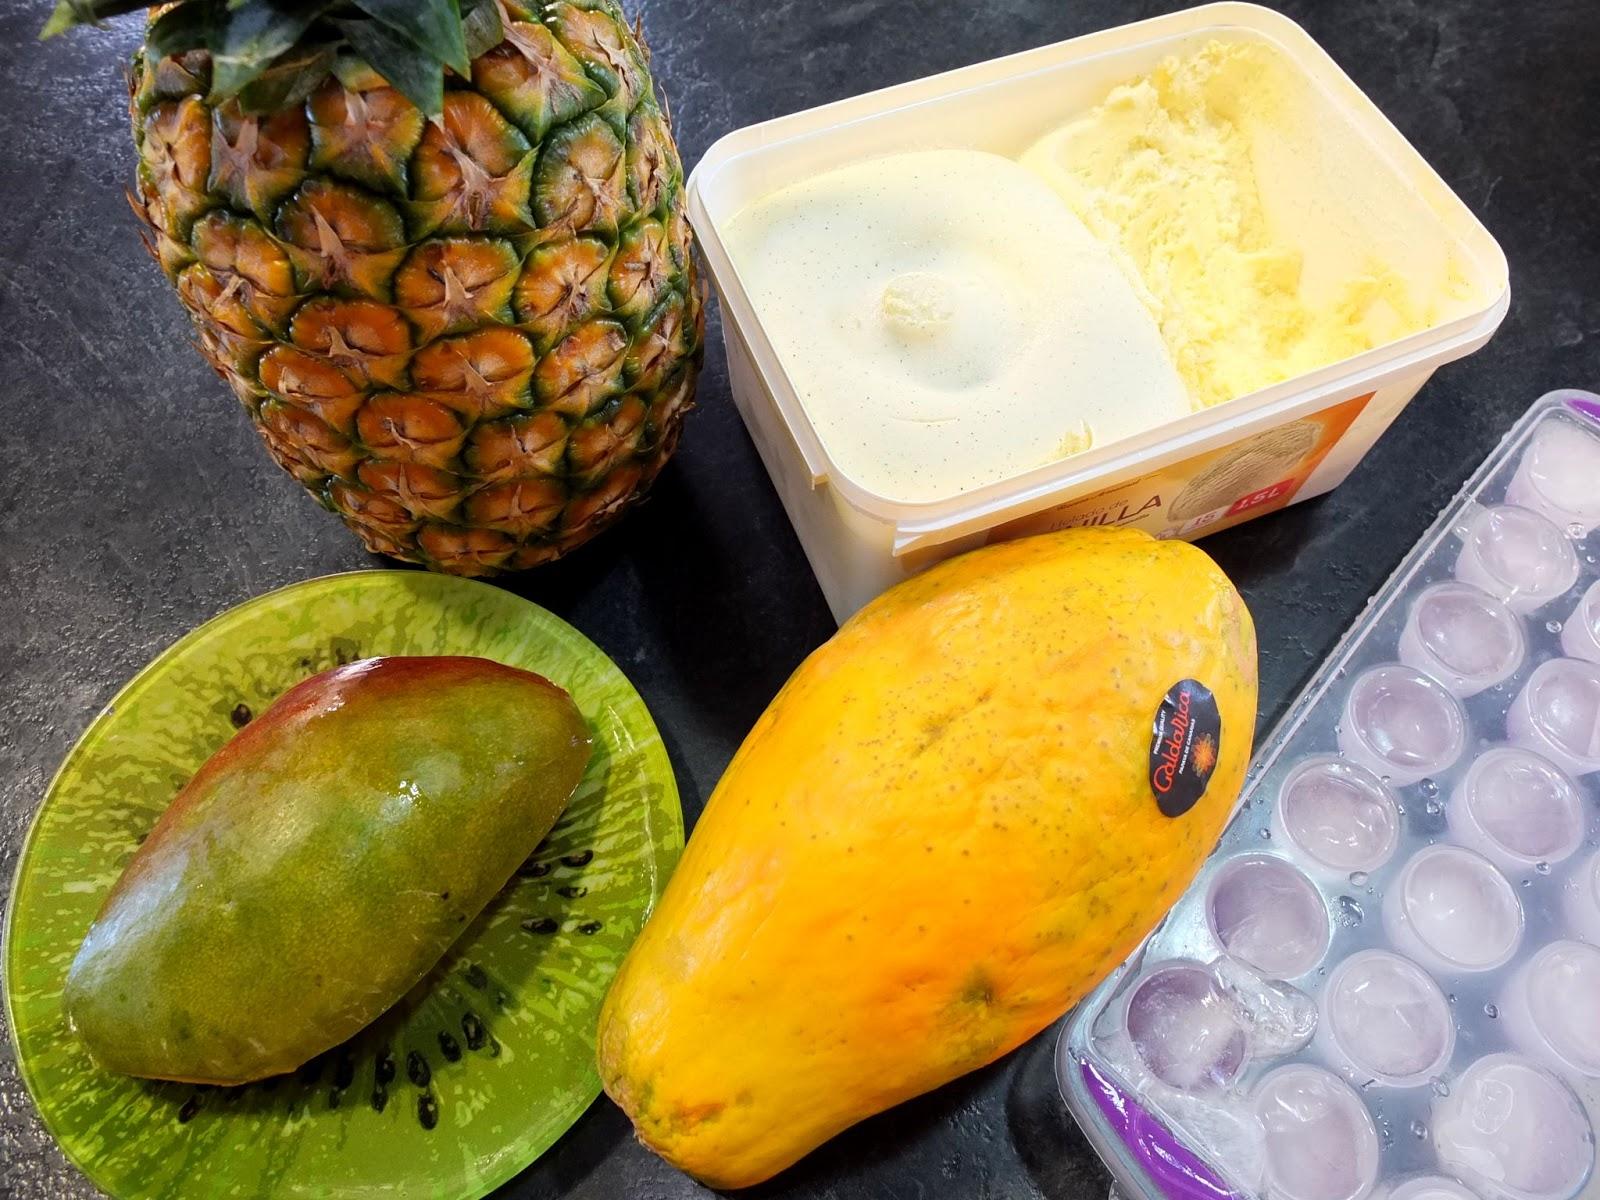 Cocinando con lola garc a smoothie helado de mango pi a for Cocinar con mango